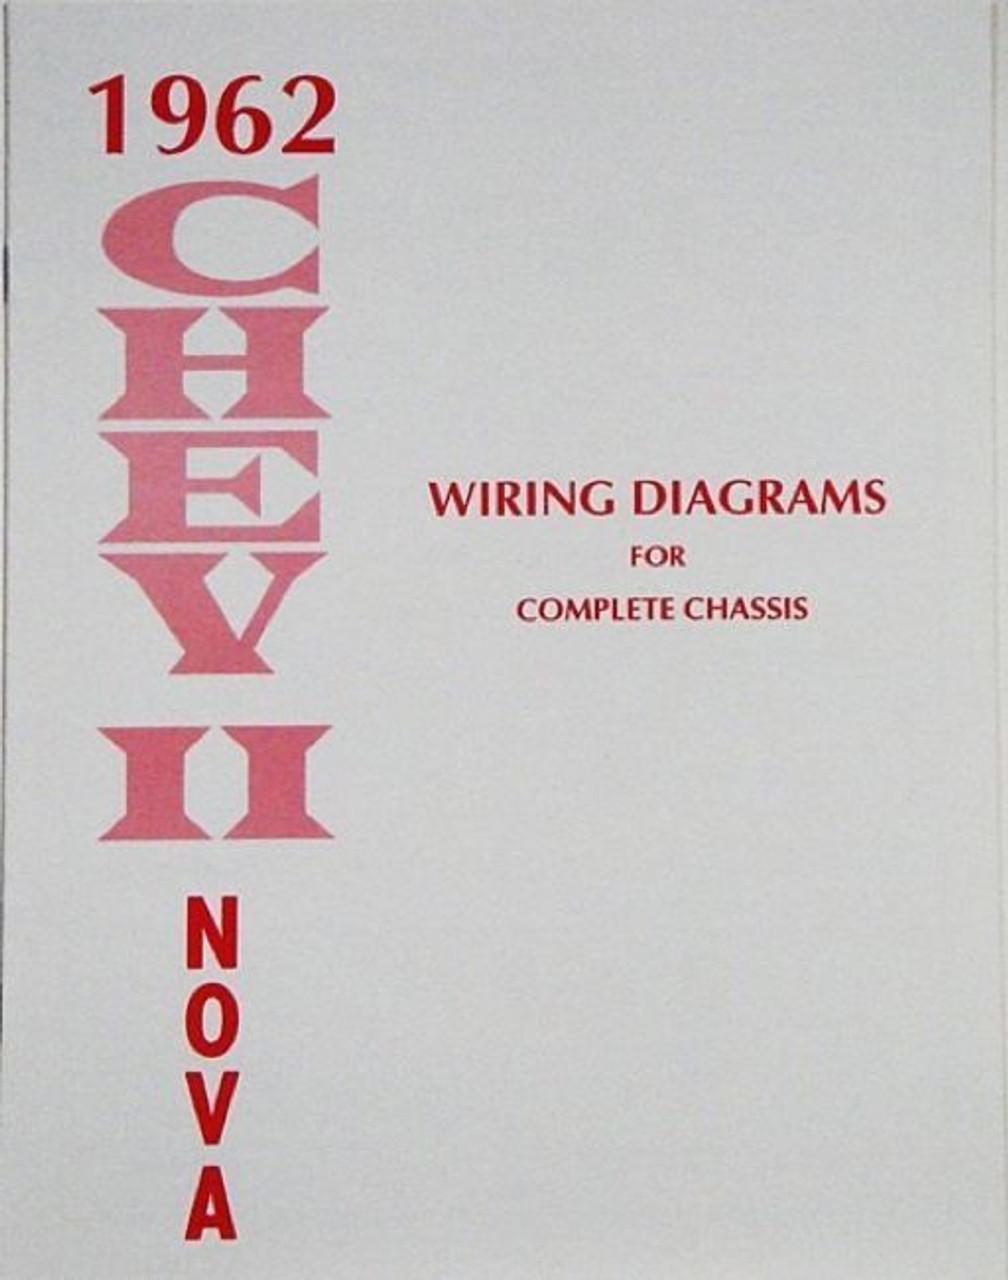 62 Nova Engine Wiring Diagram. 1964 Impala Wiring Diagram, 67 ... Ezgo Golf Cart Wiring Diagram G on